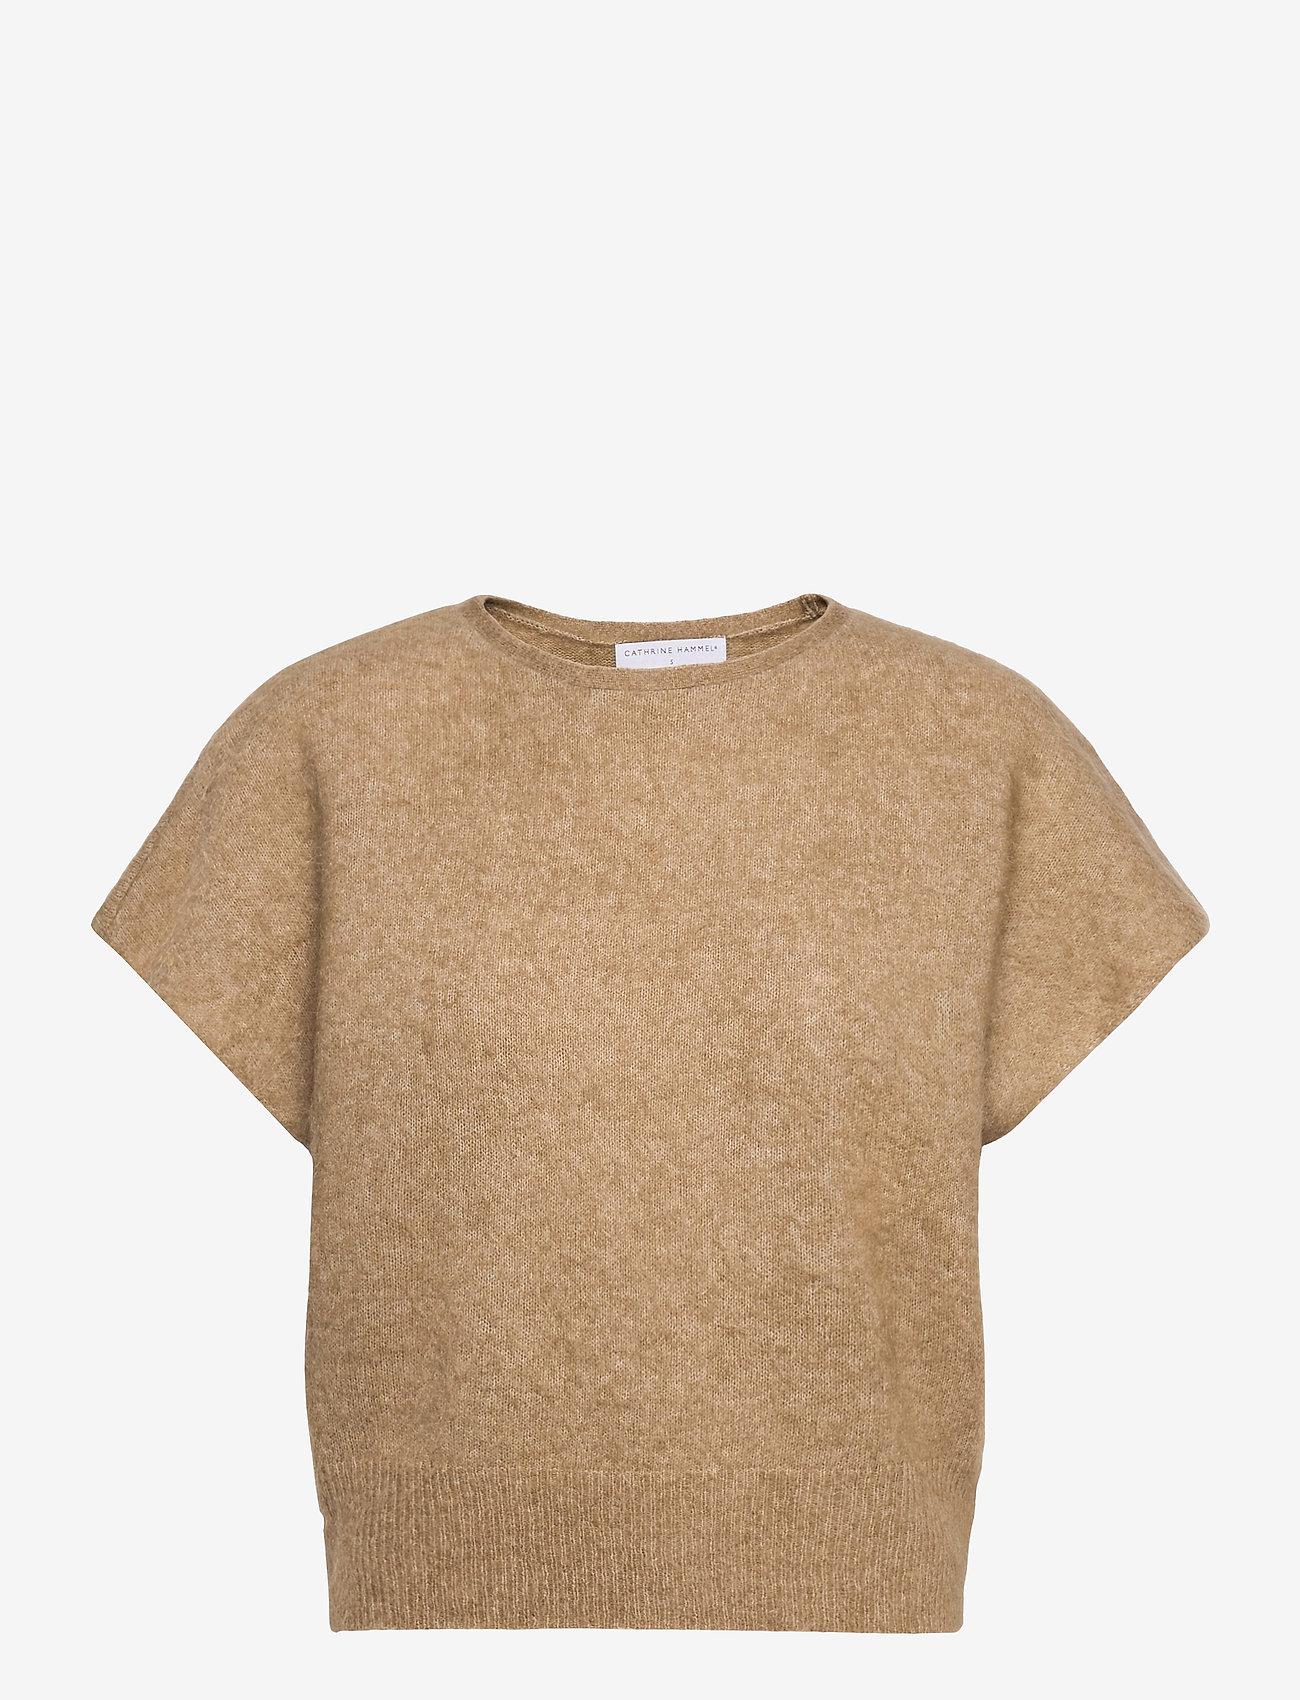 Cathrine Hammel - Soft wide sleeveless top - strikkede toppe - camel - 0